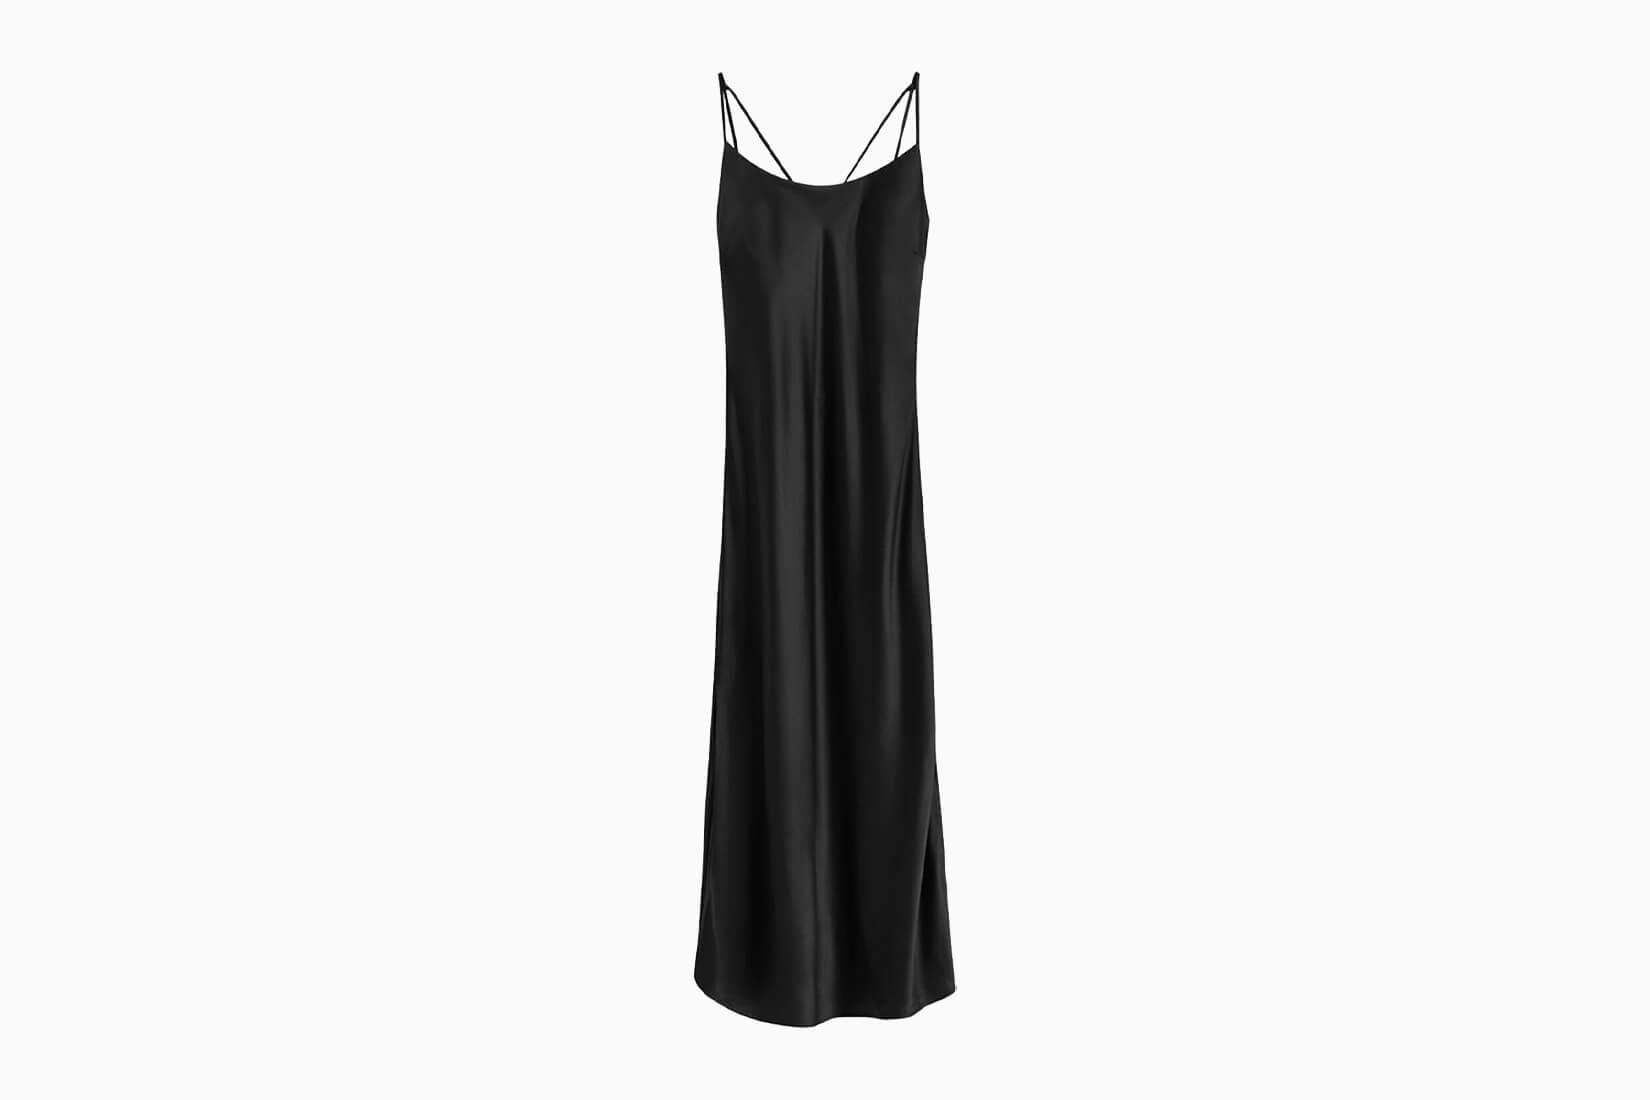 best little black dresses cuyana charmeuse - Luxe Digital